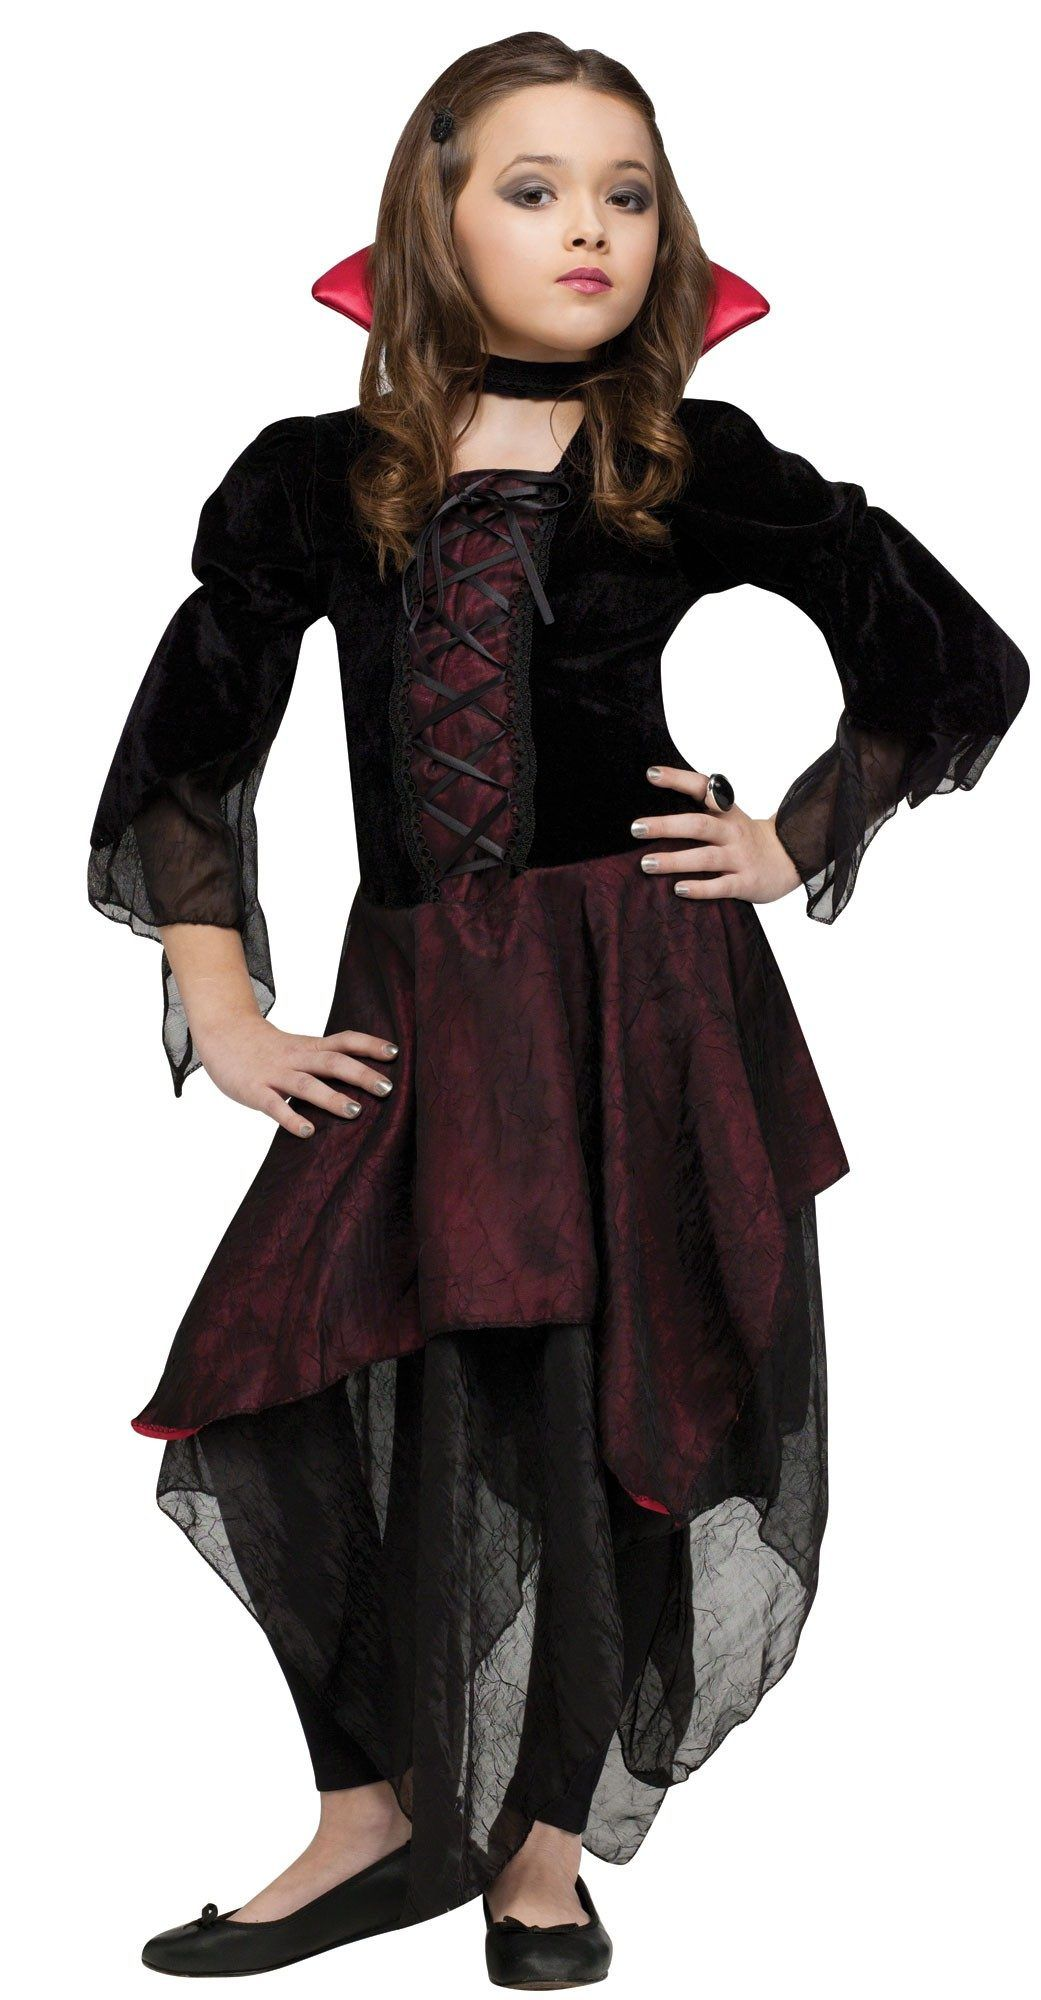 Dracula Costumes. Trick or Treat as Kids Lady Dracula Girl